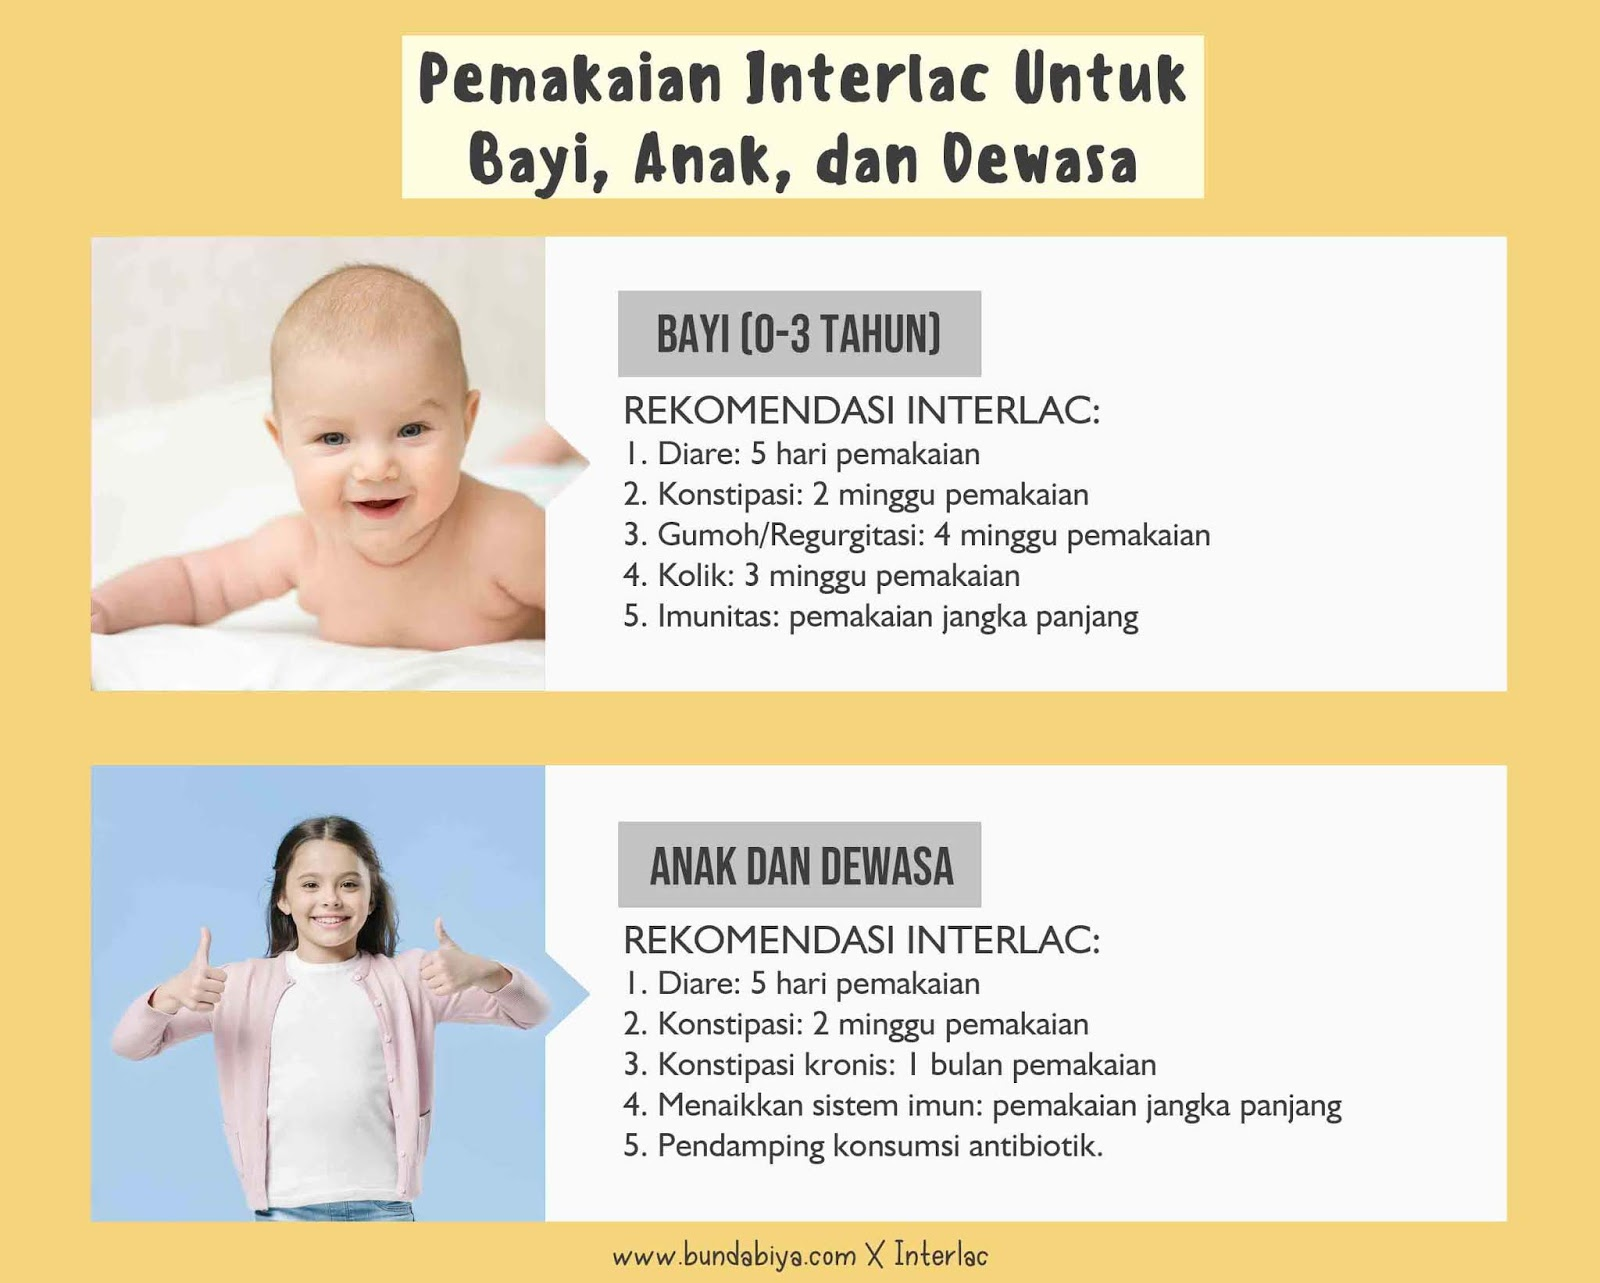 mengatasi sembelit pada bayi, mengatasi sembelit pada anak, mengatasi sembelit parah, skin tag di anus bayi, bayi skin tag, bayi ambeien, penyebab sembelit parah pada bayi, solusi sembelit parah pada bayi, buah alpukat untuk mengatasi sembelit pada bayi, interlac untuk sembelit, kegunaan interlac, interlac obat apa, interlac untuk bayi, interlac untuk ibu hamil, interlac untuk diare, interlac untuk anak 1 tahun, interlac untuk anak 3 tahun, interlac untuk  bayi baru lahir, interlac untuk bayi susah bab, interlac untuk mencret, interlac untuk bayi sembelit, interlac sachet, interlac tablet kunyah, interlac drops, harga interlac, interlac harga, mengatasi sembelit parah pada bayi dan anak